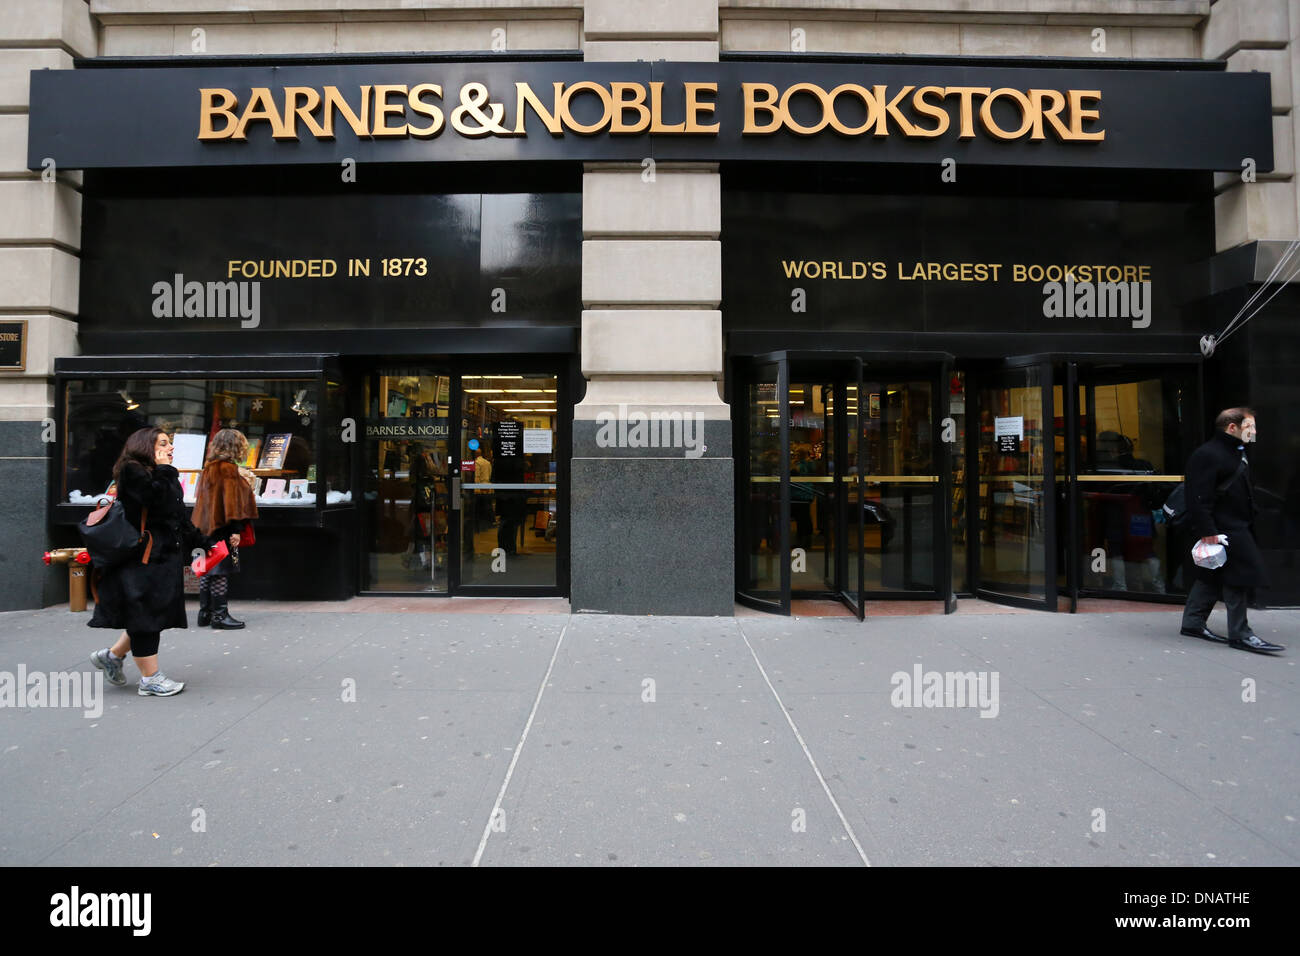 historical storefront] barnes \u0026 noble bookstore chelsea, 105 fifth[historical storefront] barnes \u0026 noble bookstore chelsea, 105 fifth ave, new york, ny